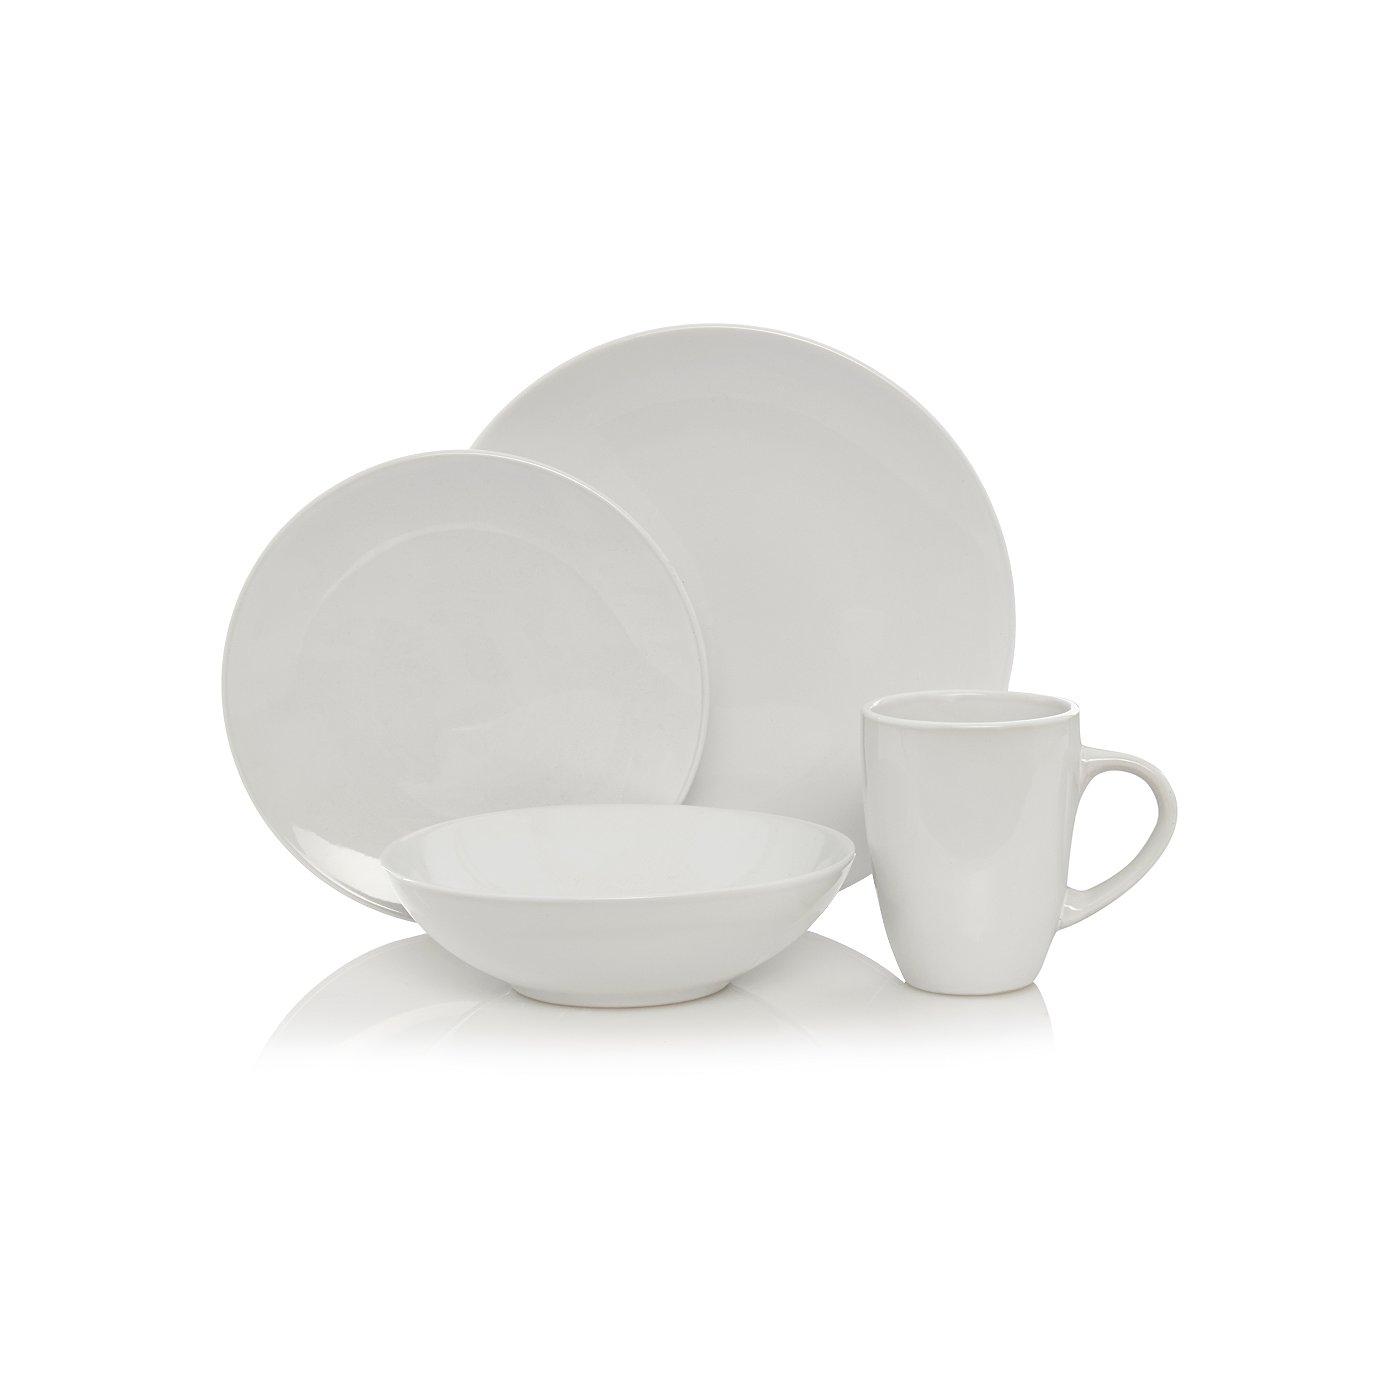 George Home White Kitchen Range | Tableware | George at ASDA